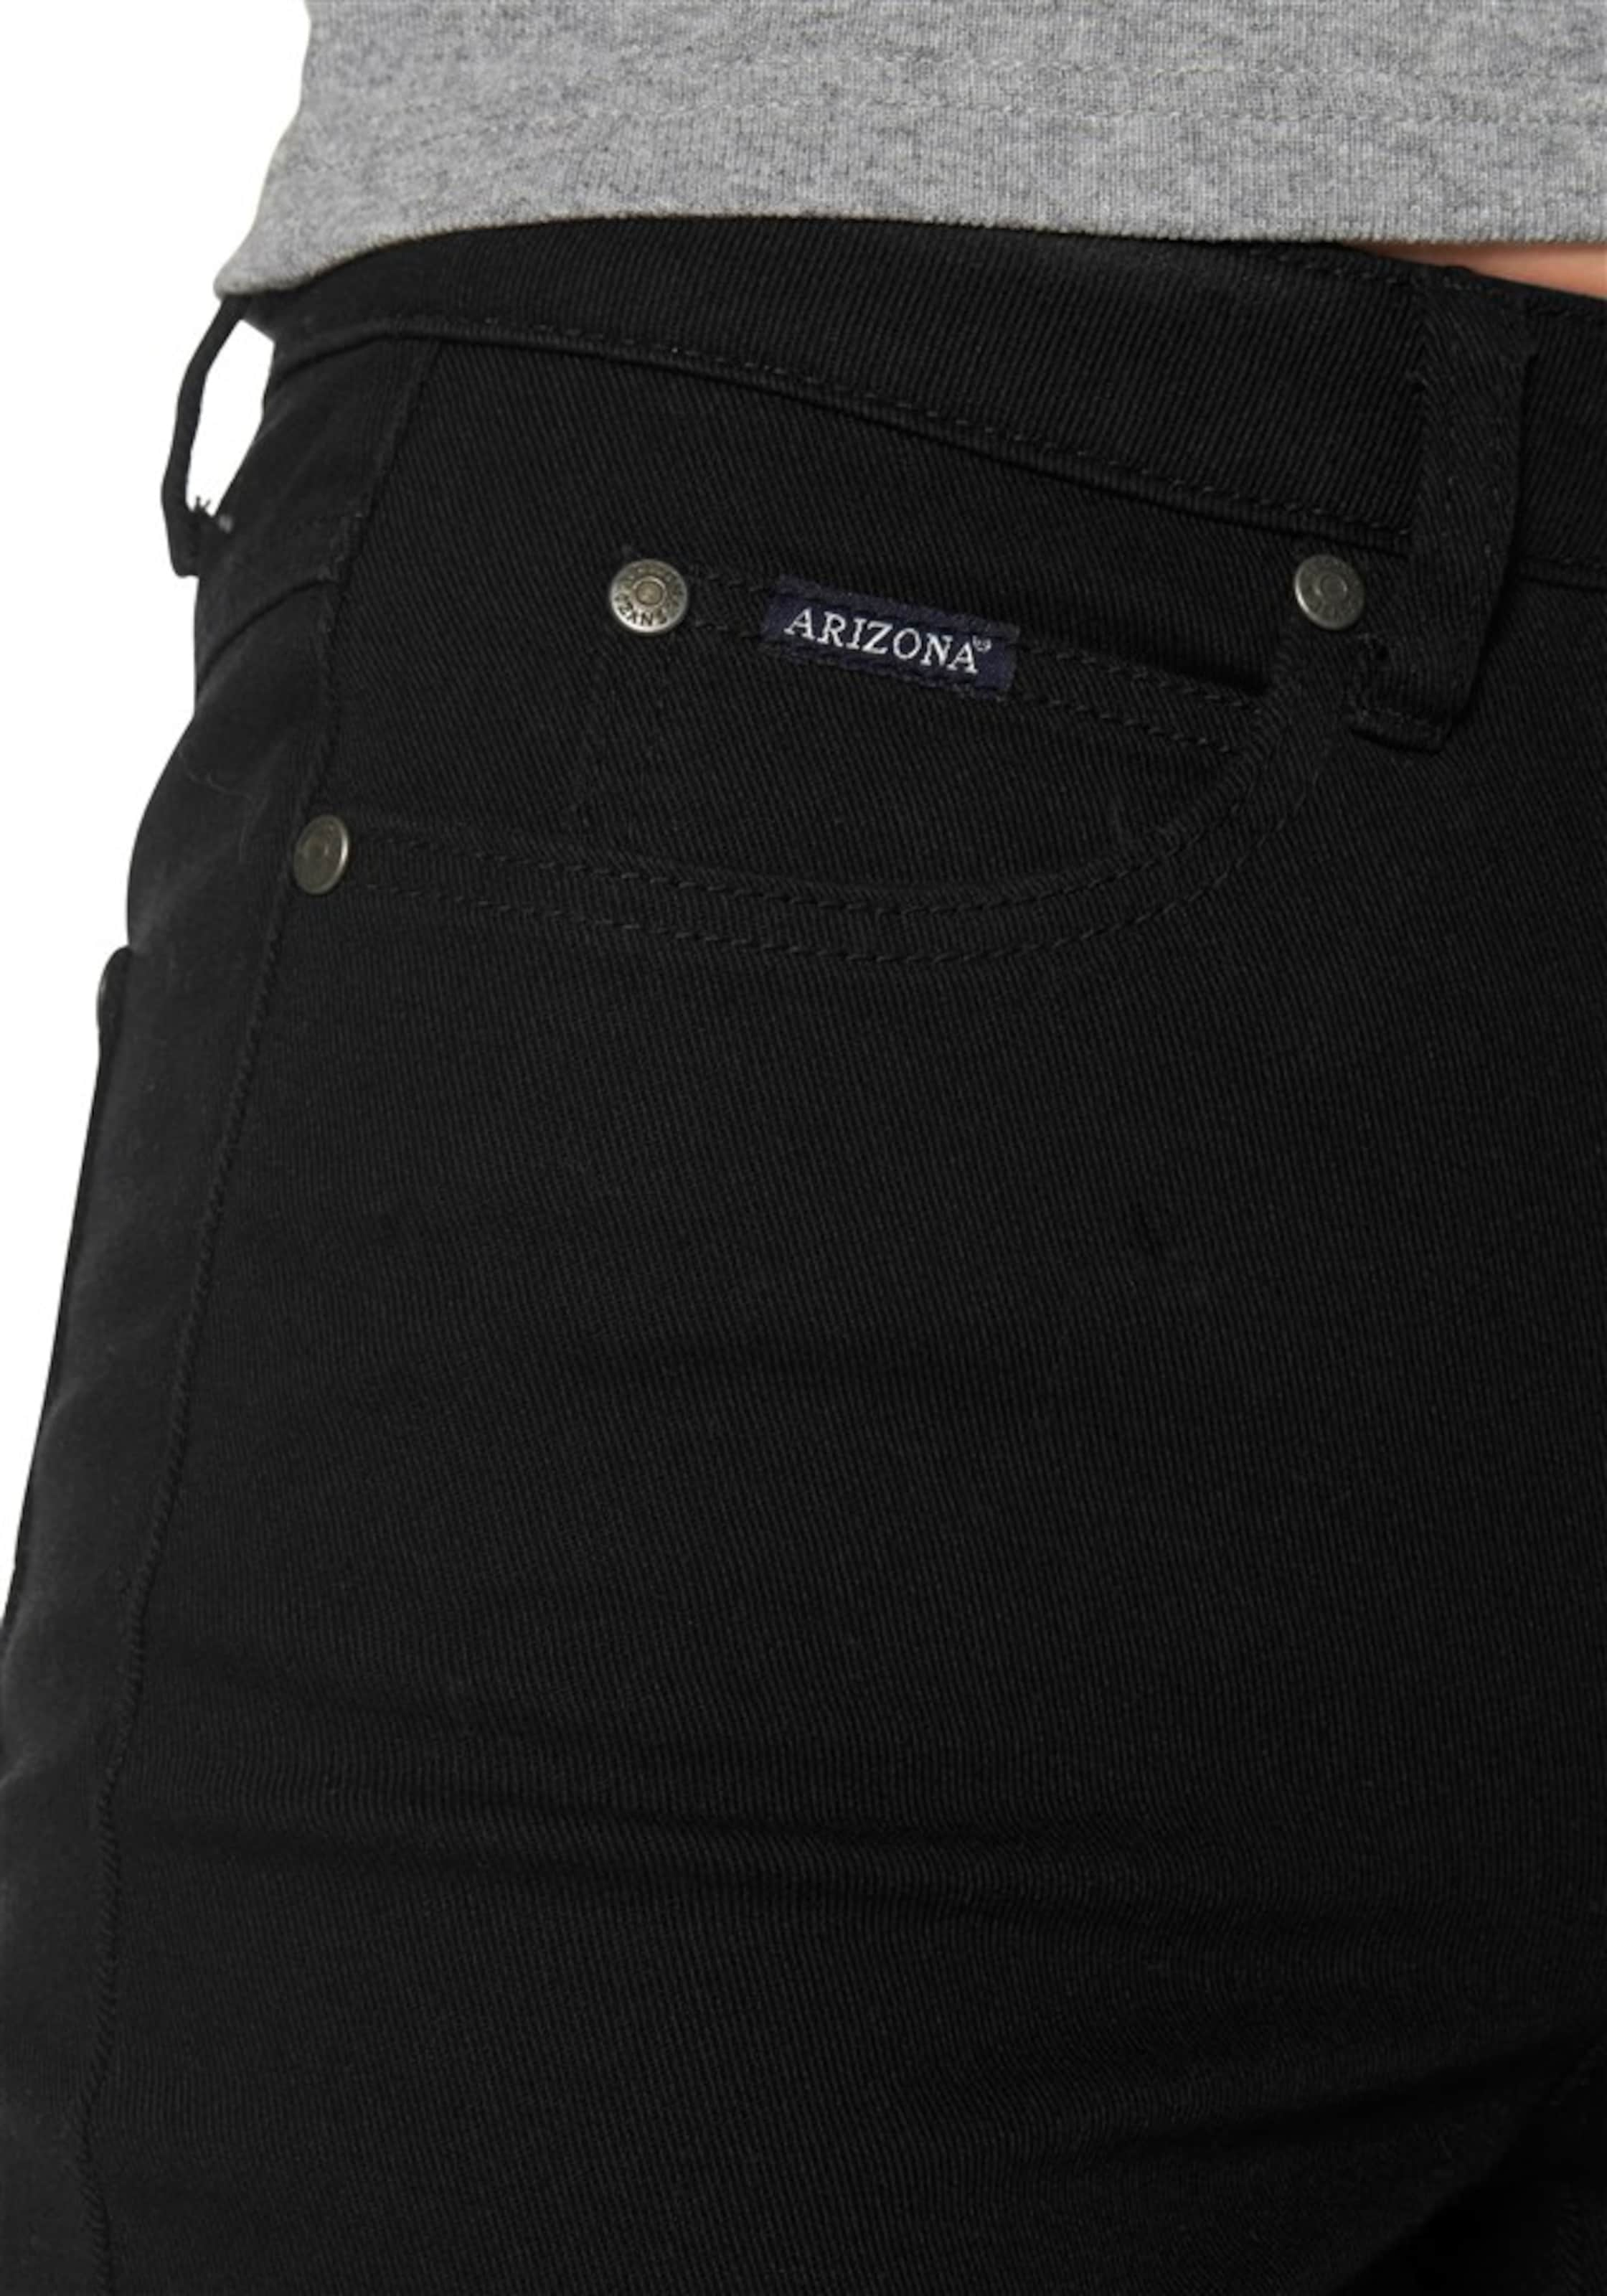 In 'relax Schwarz Jeans Arizona fit' hCtsQrdx